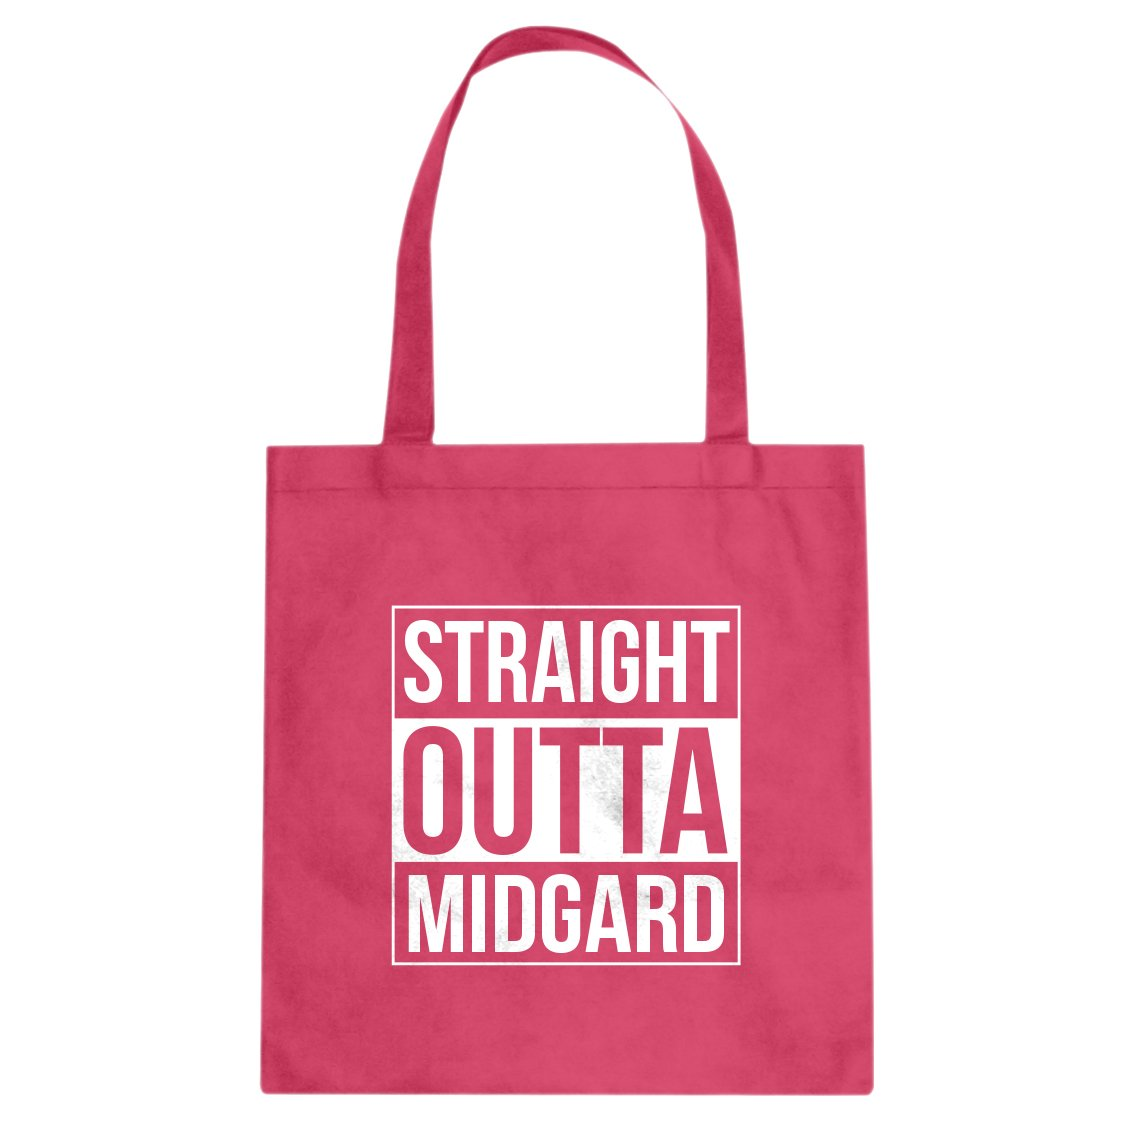 Indica Plateau Straight Outta Midgard Cotton Canvas Tote Bag